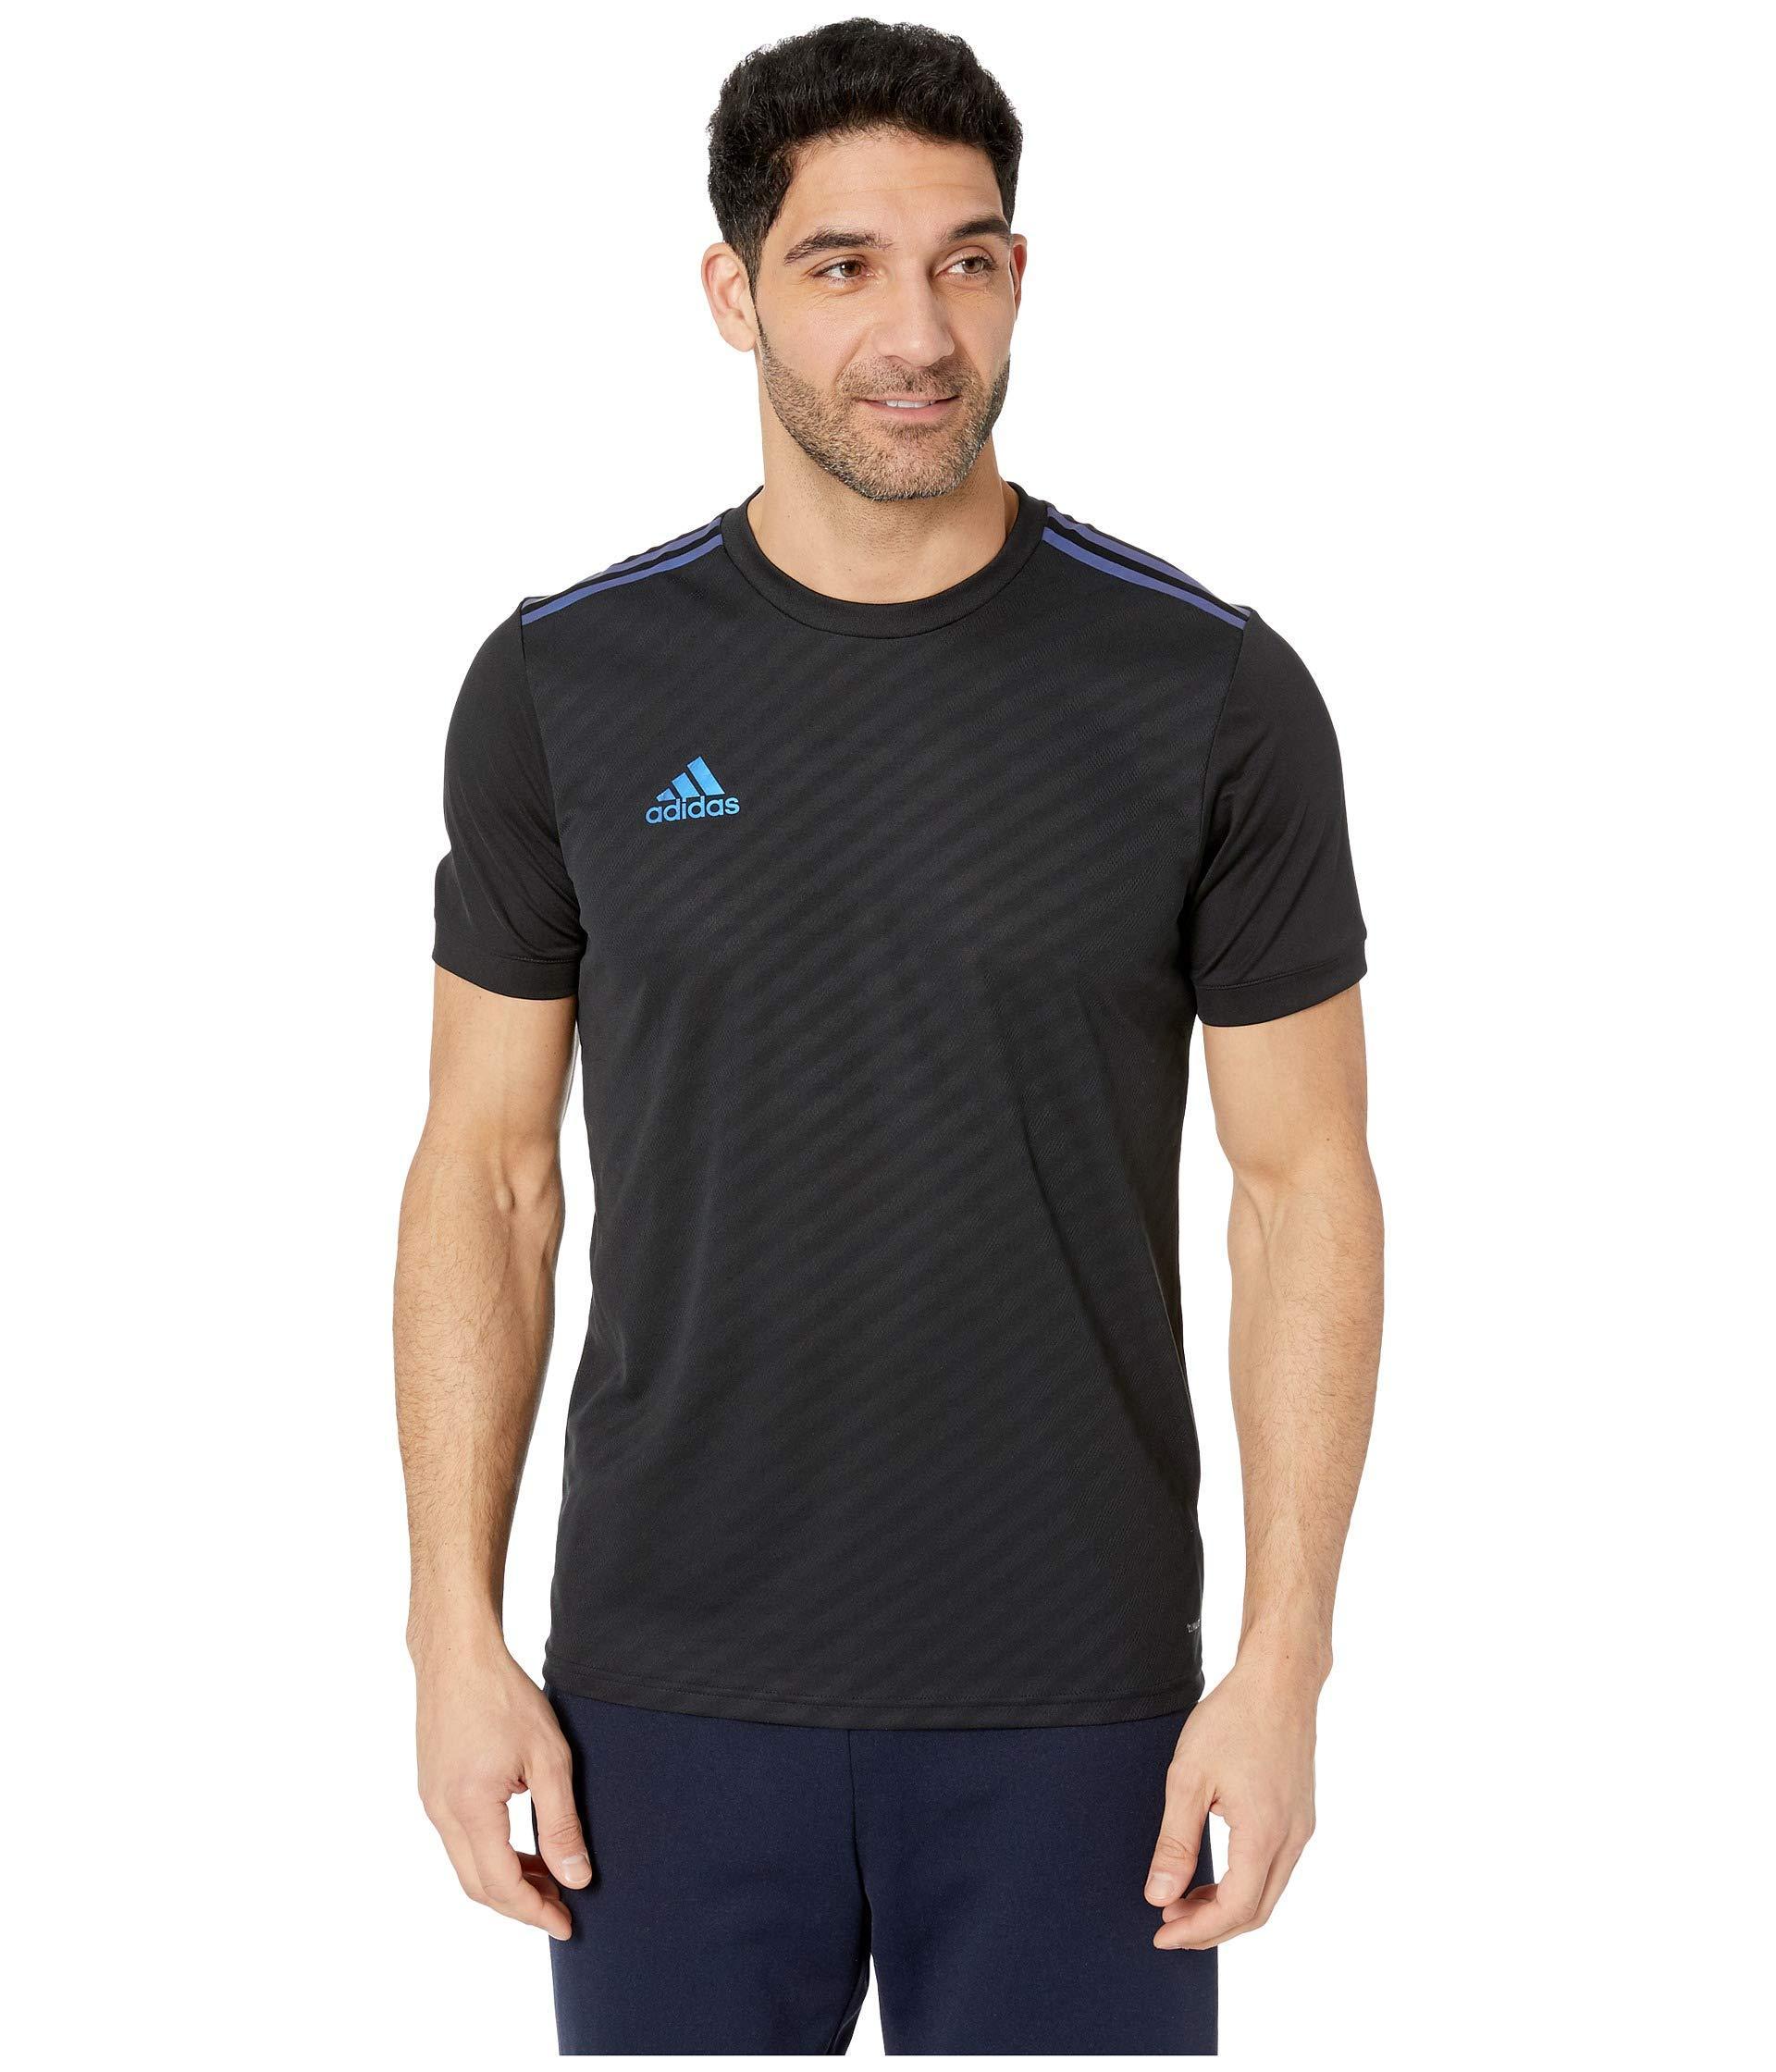 adidas Synthetic Afs Tiro Jersey (black/blue Pearl Essence) Men's ...